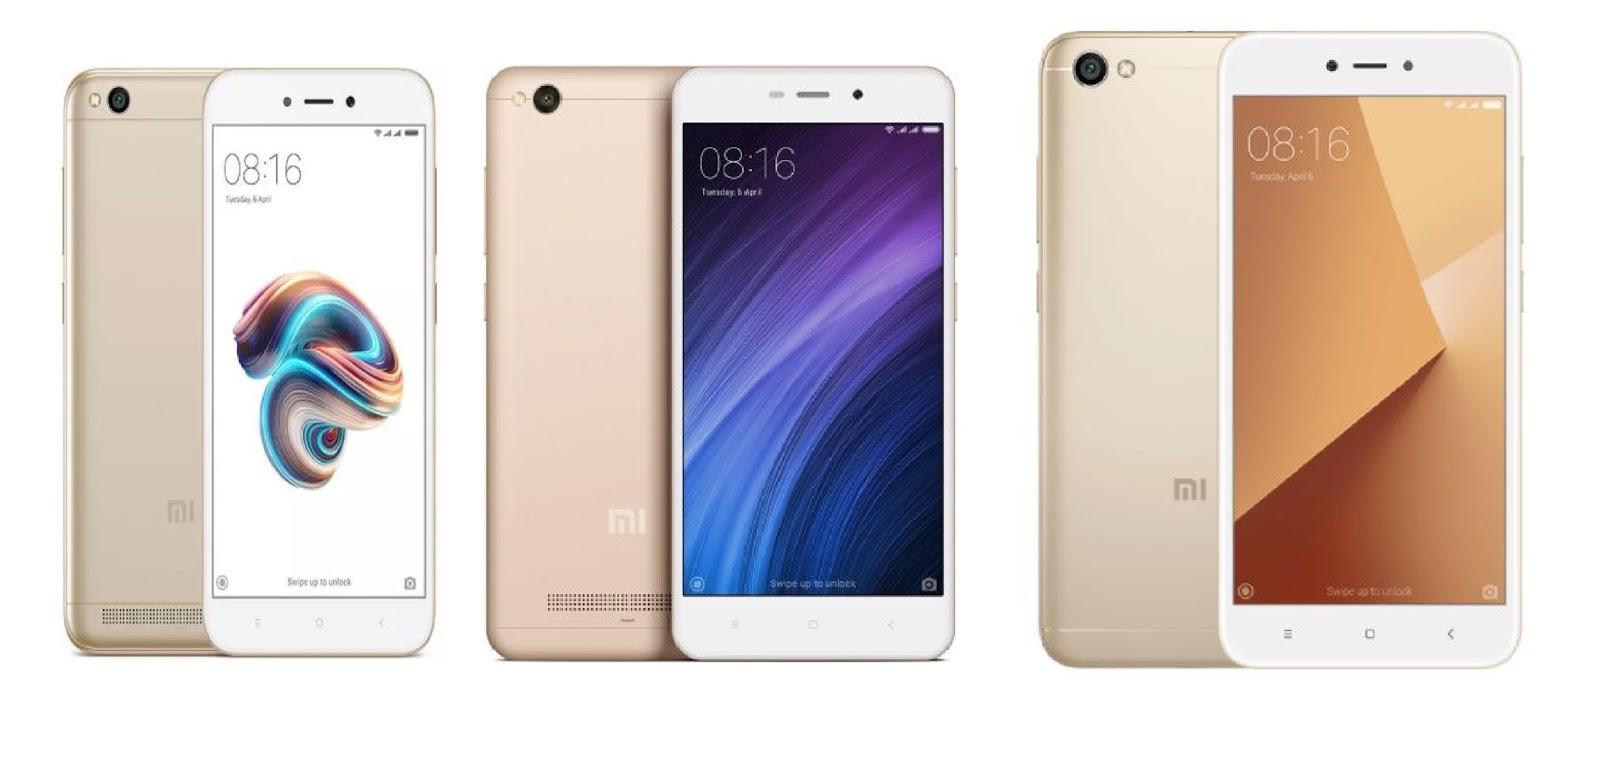 Xiaomi Redmi 5a Vs 4a Y1 Lite Hd Displaysnapdragon 3 32gb Gold